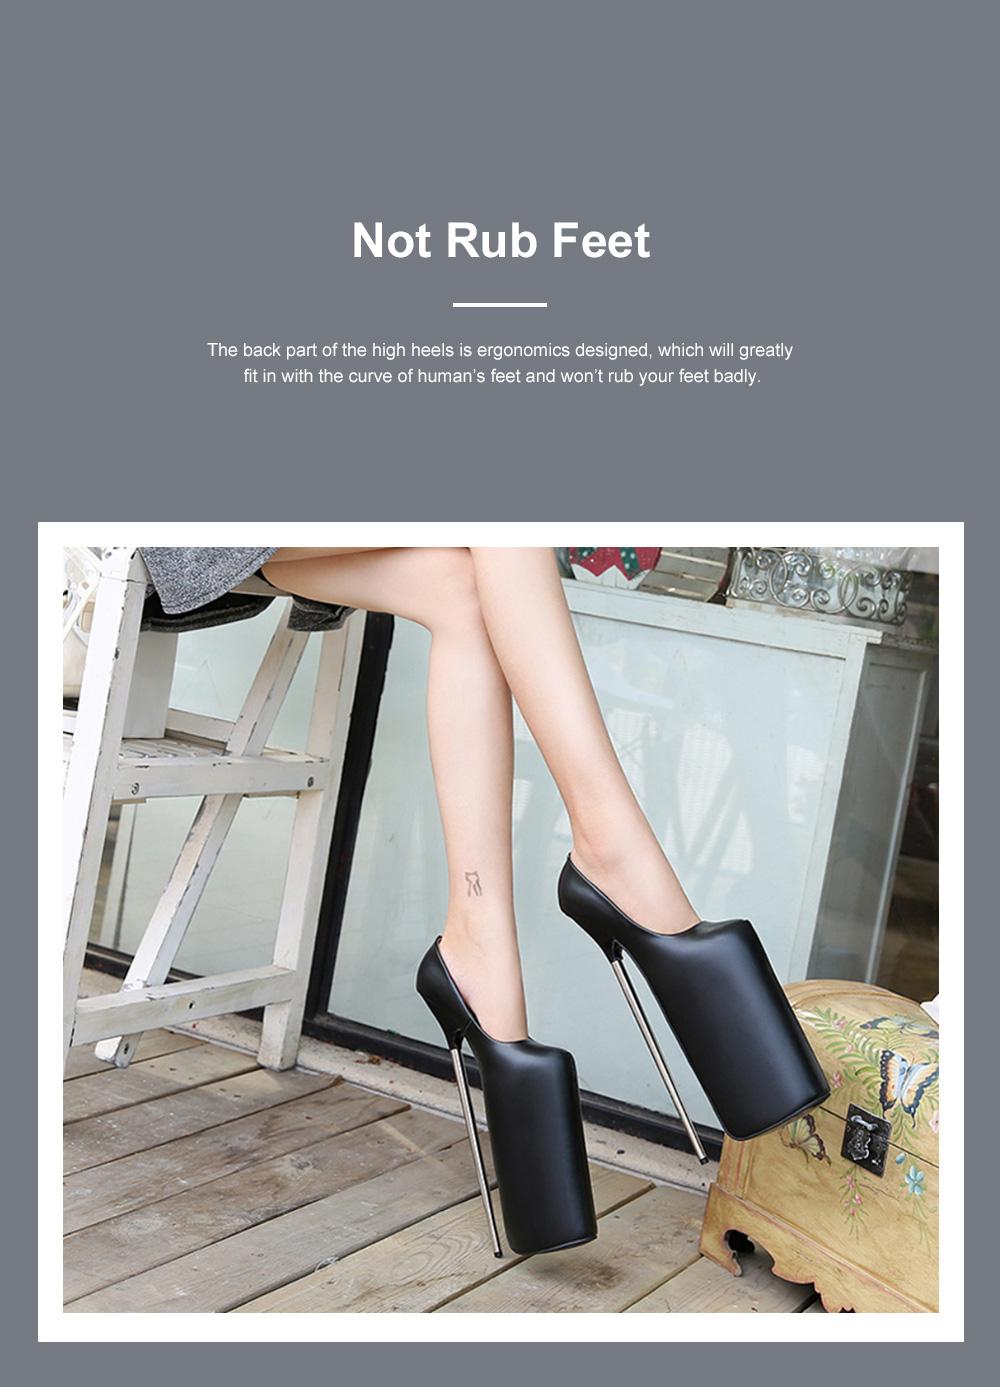 Stylish Sexy 30cm Platform Design High Heels Soft Skin-friendly PU Night Club Shoes with Anti-slip Rubber Sole Ins Hot 2